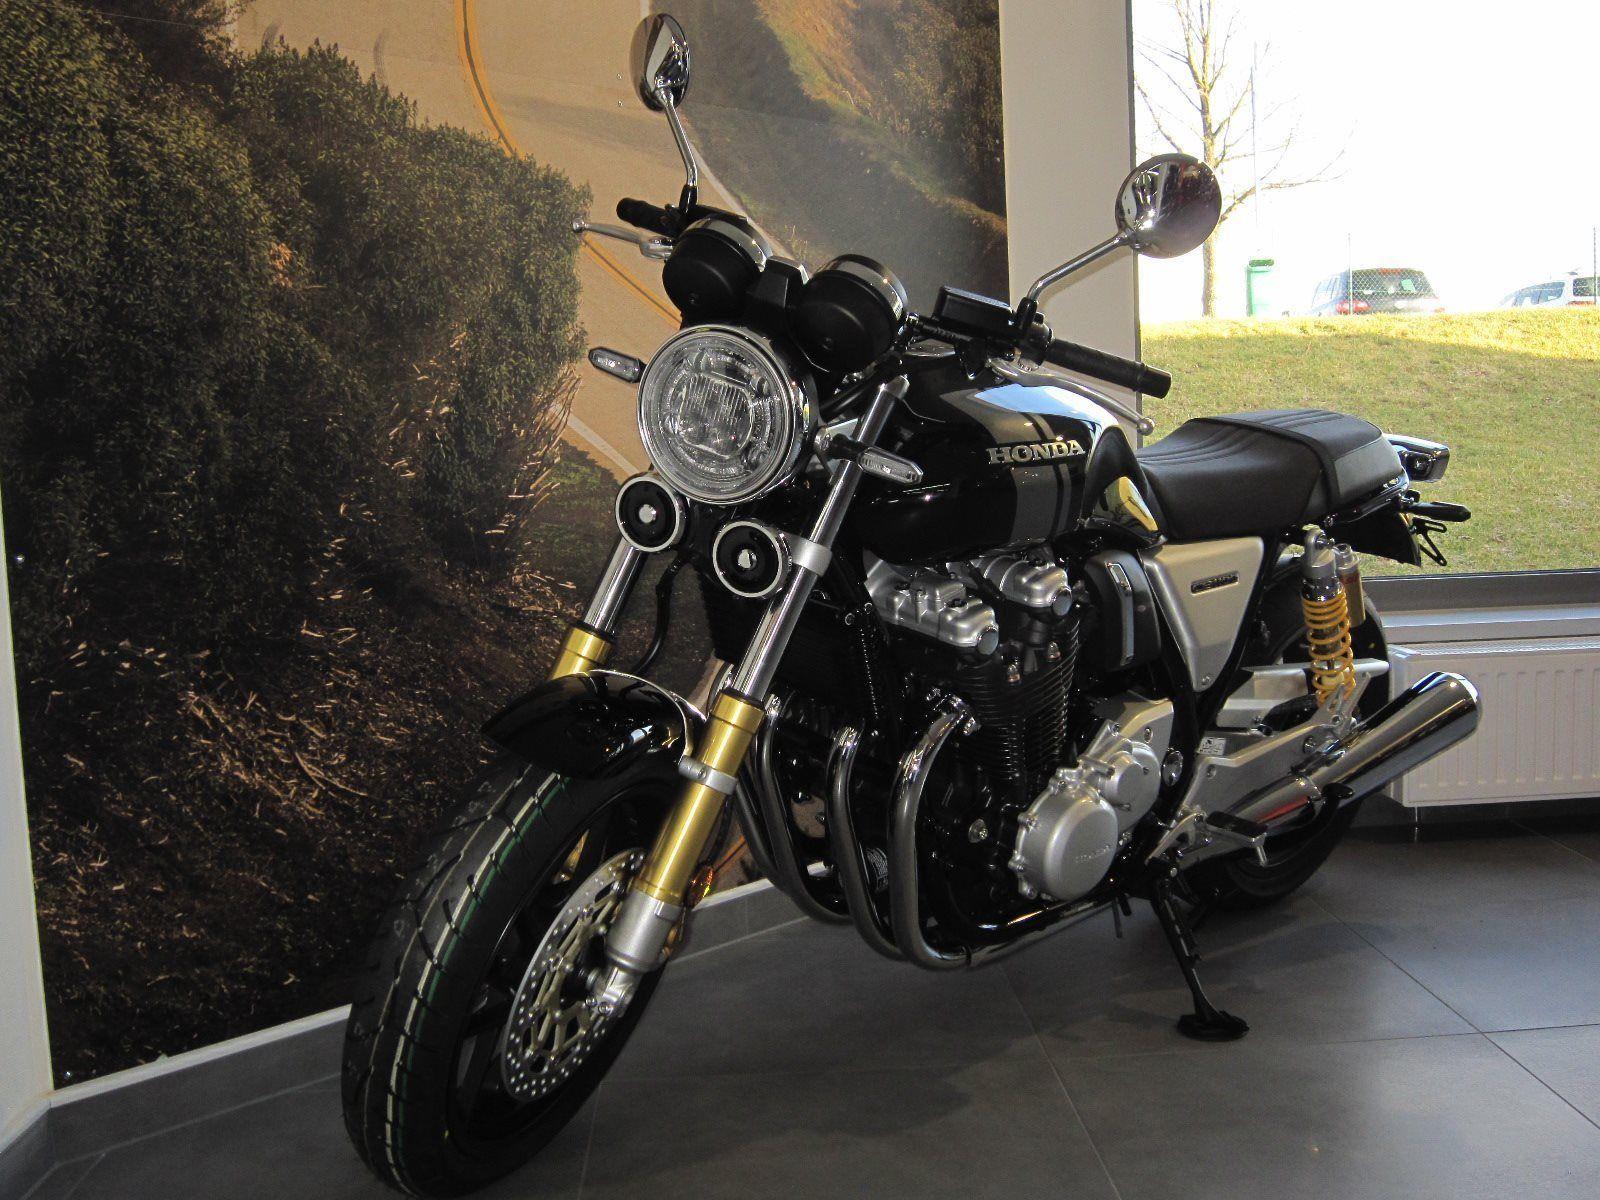 Honda Cb 1100 Rs Als Bike In Oelsnitz